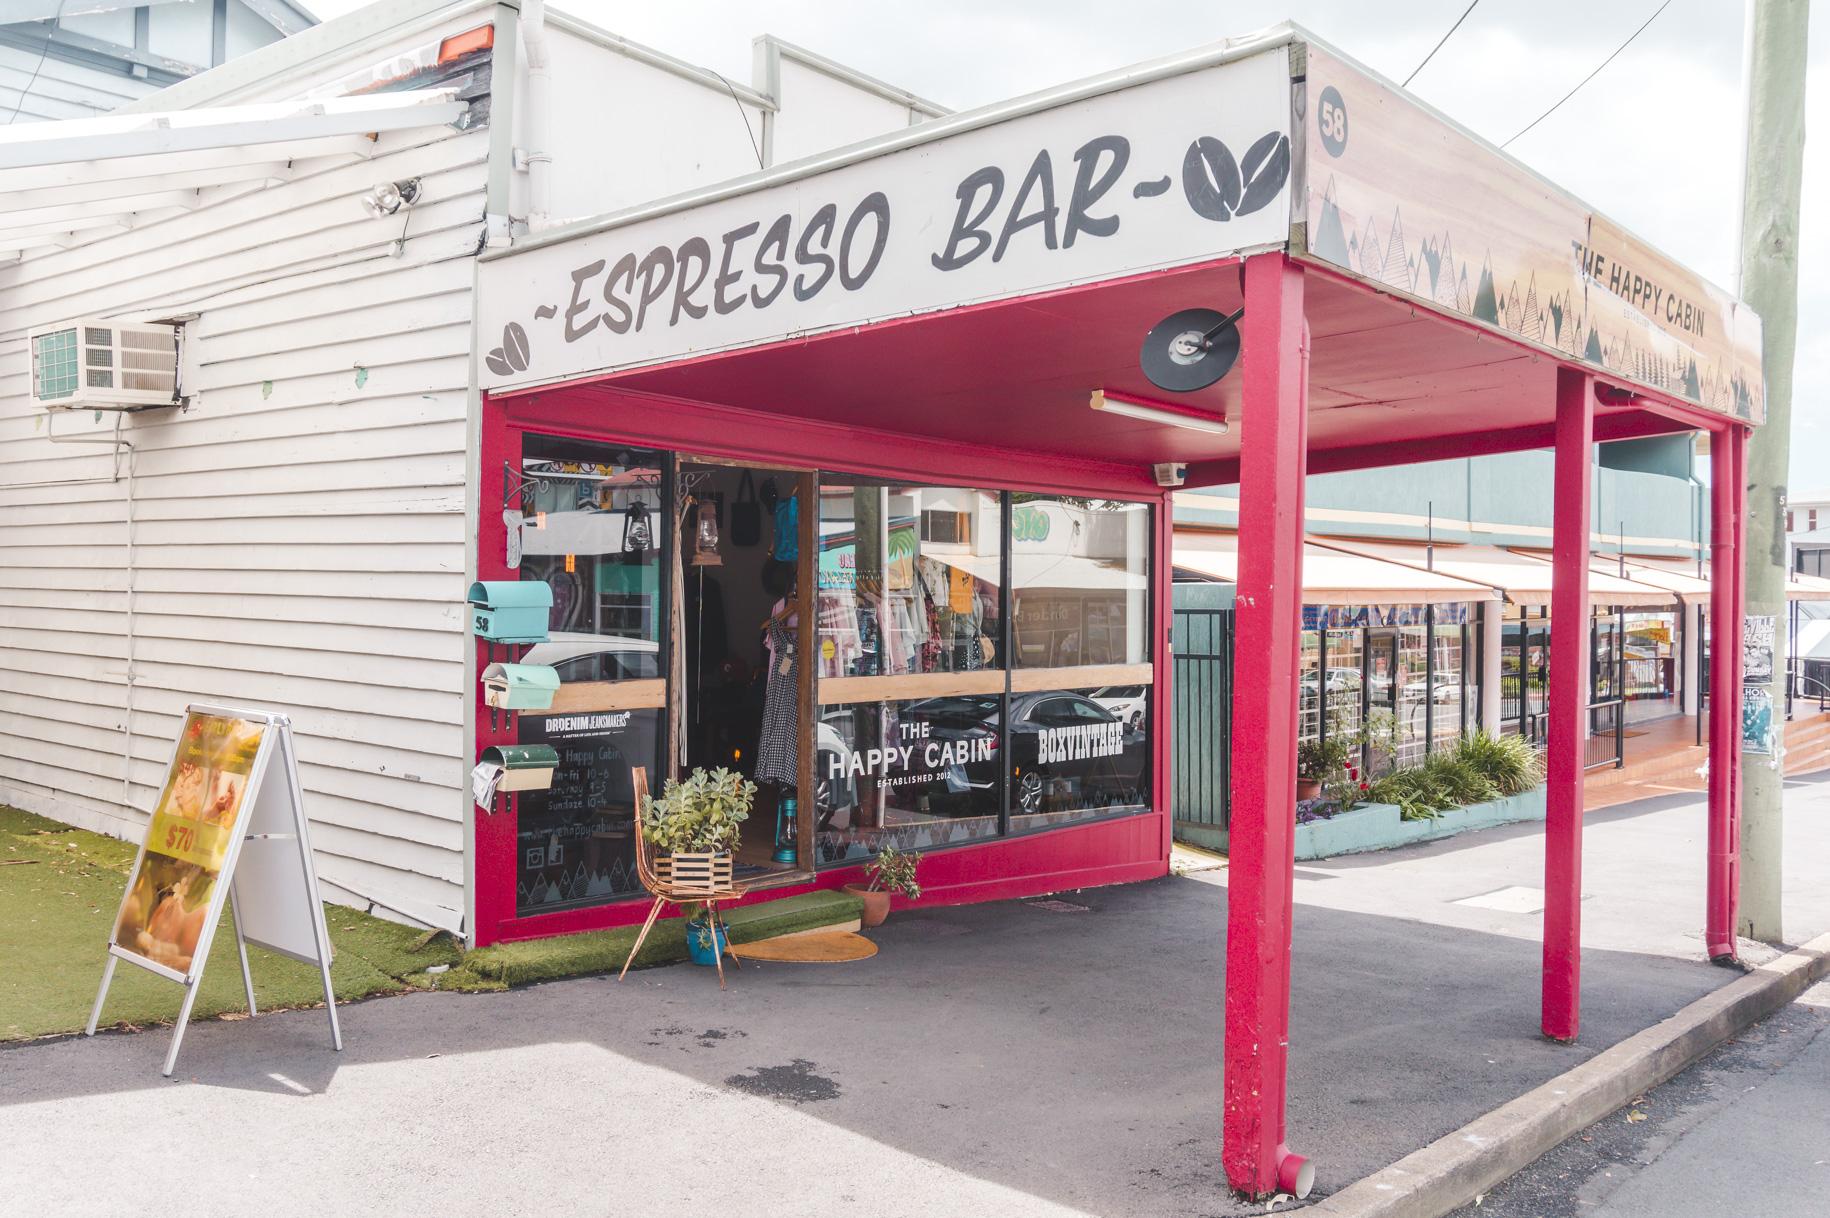 Awe Inspiring 10 Awesome Independent Stores In Brisbane Australia Download Free Architecture Designs Sospemadebymaigaardcom